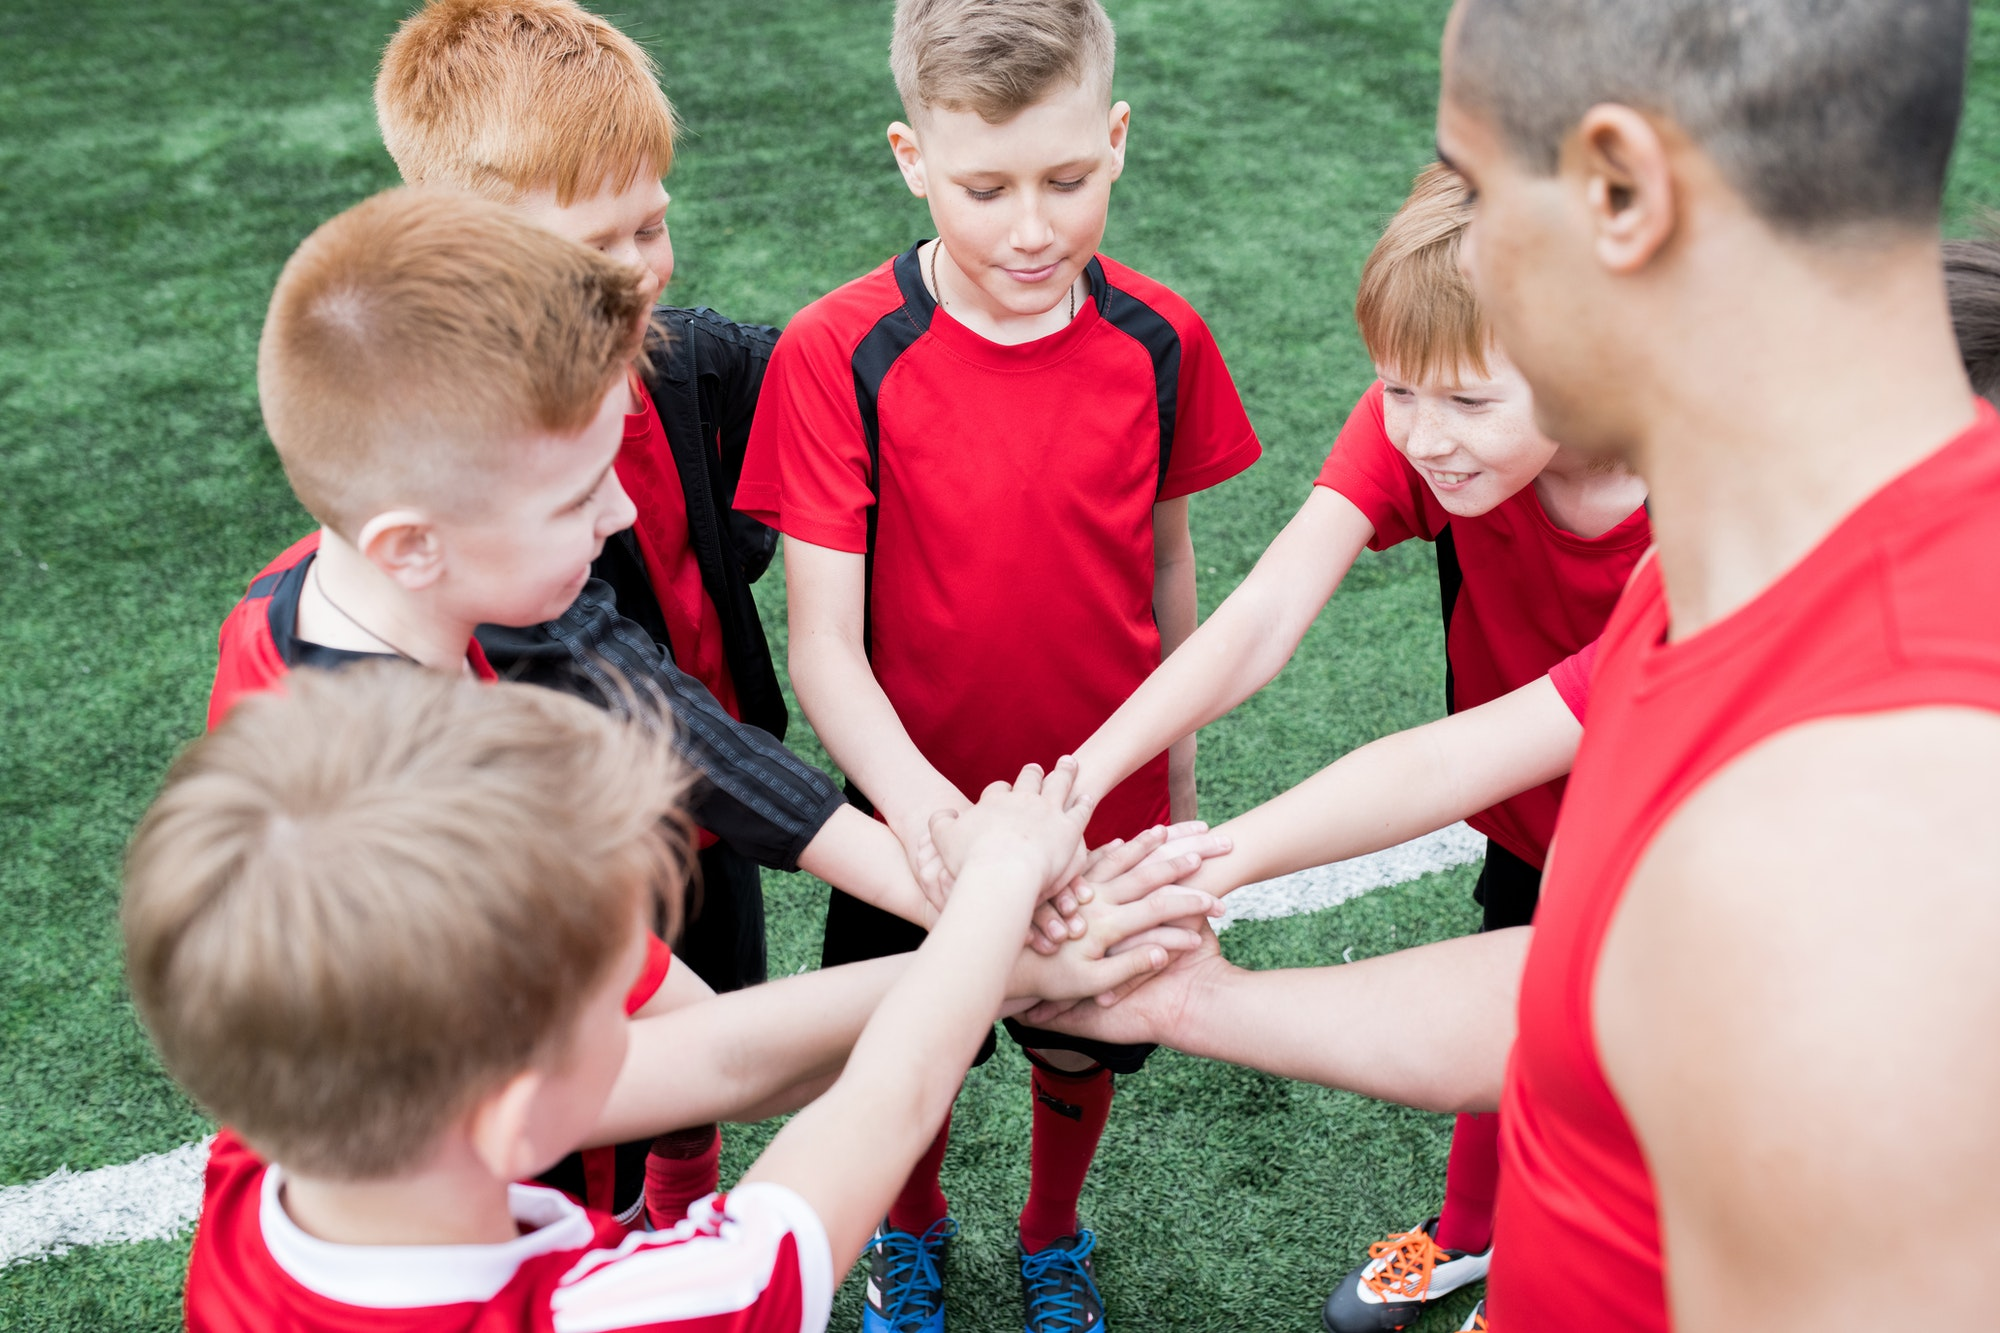 kids-joining-hands-before-match.jpg